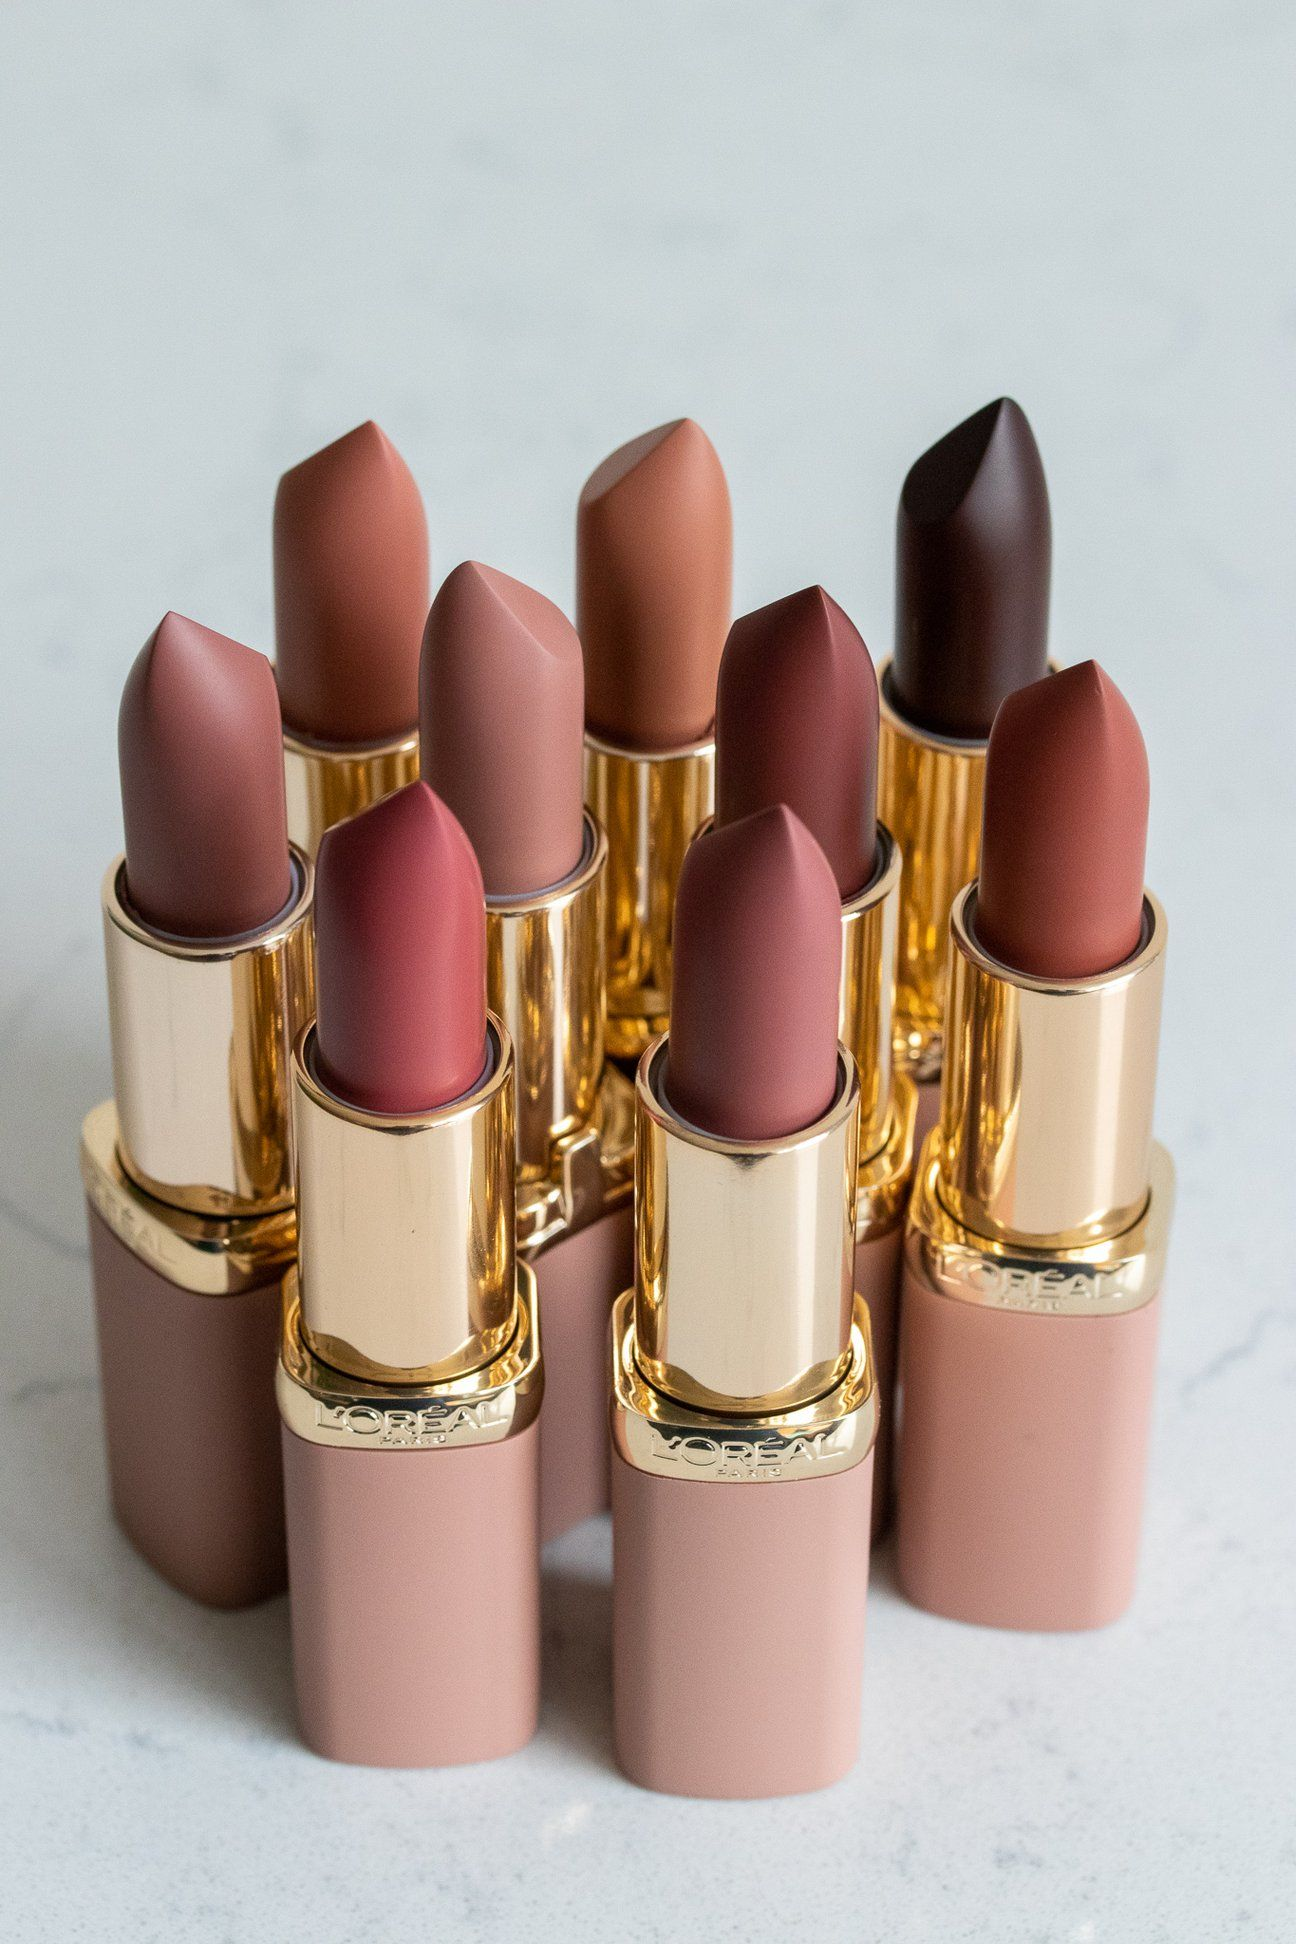 Photo of L'Oreal Paris Color Riche Ultra Matte Free The Nudes Lipstick